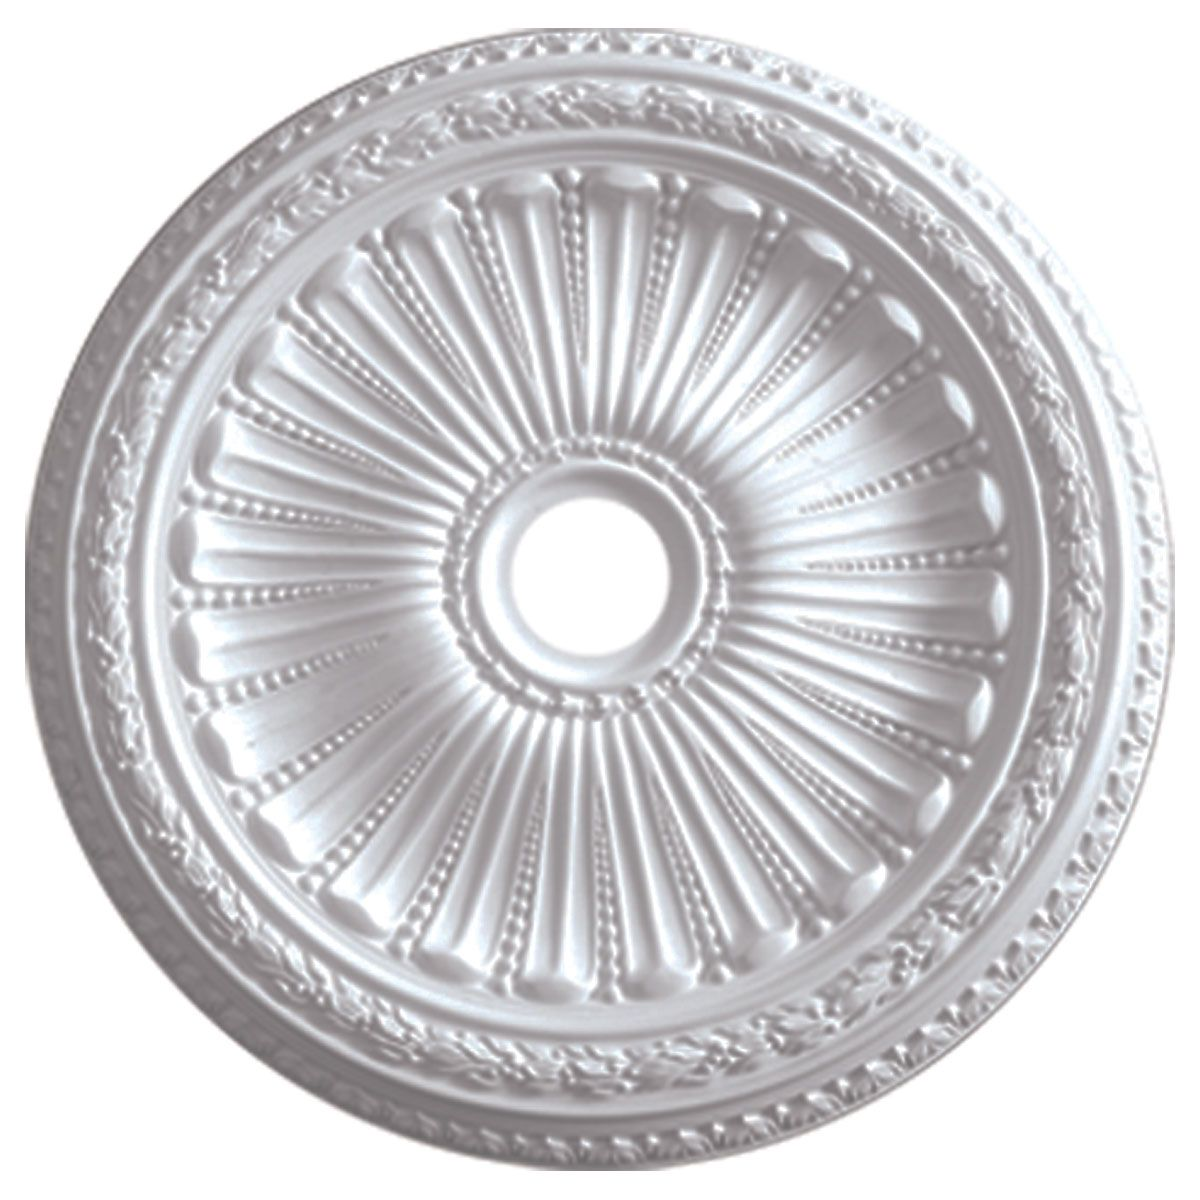 Acanthus Ceiling Medallion Solid Urethane Maximum Durability Detail Best New